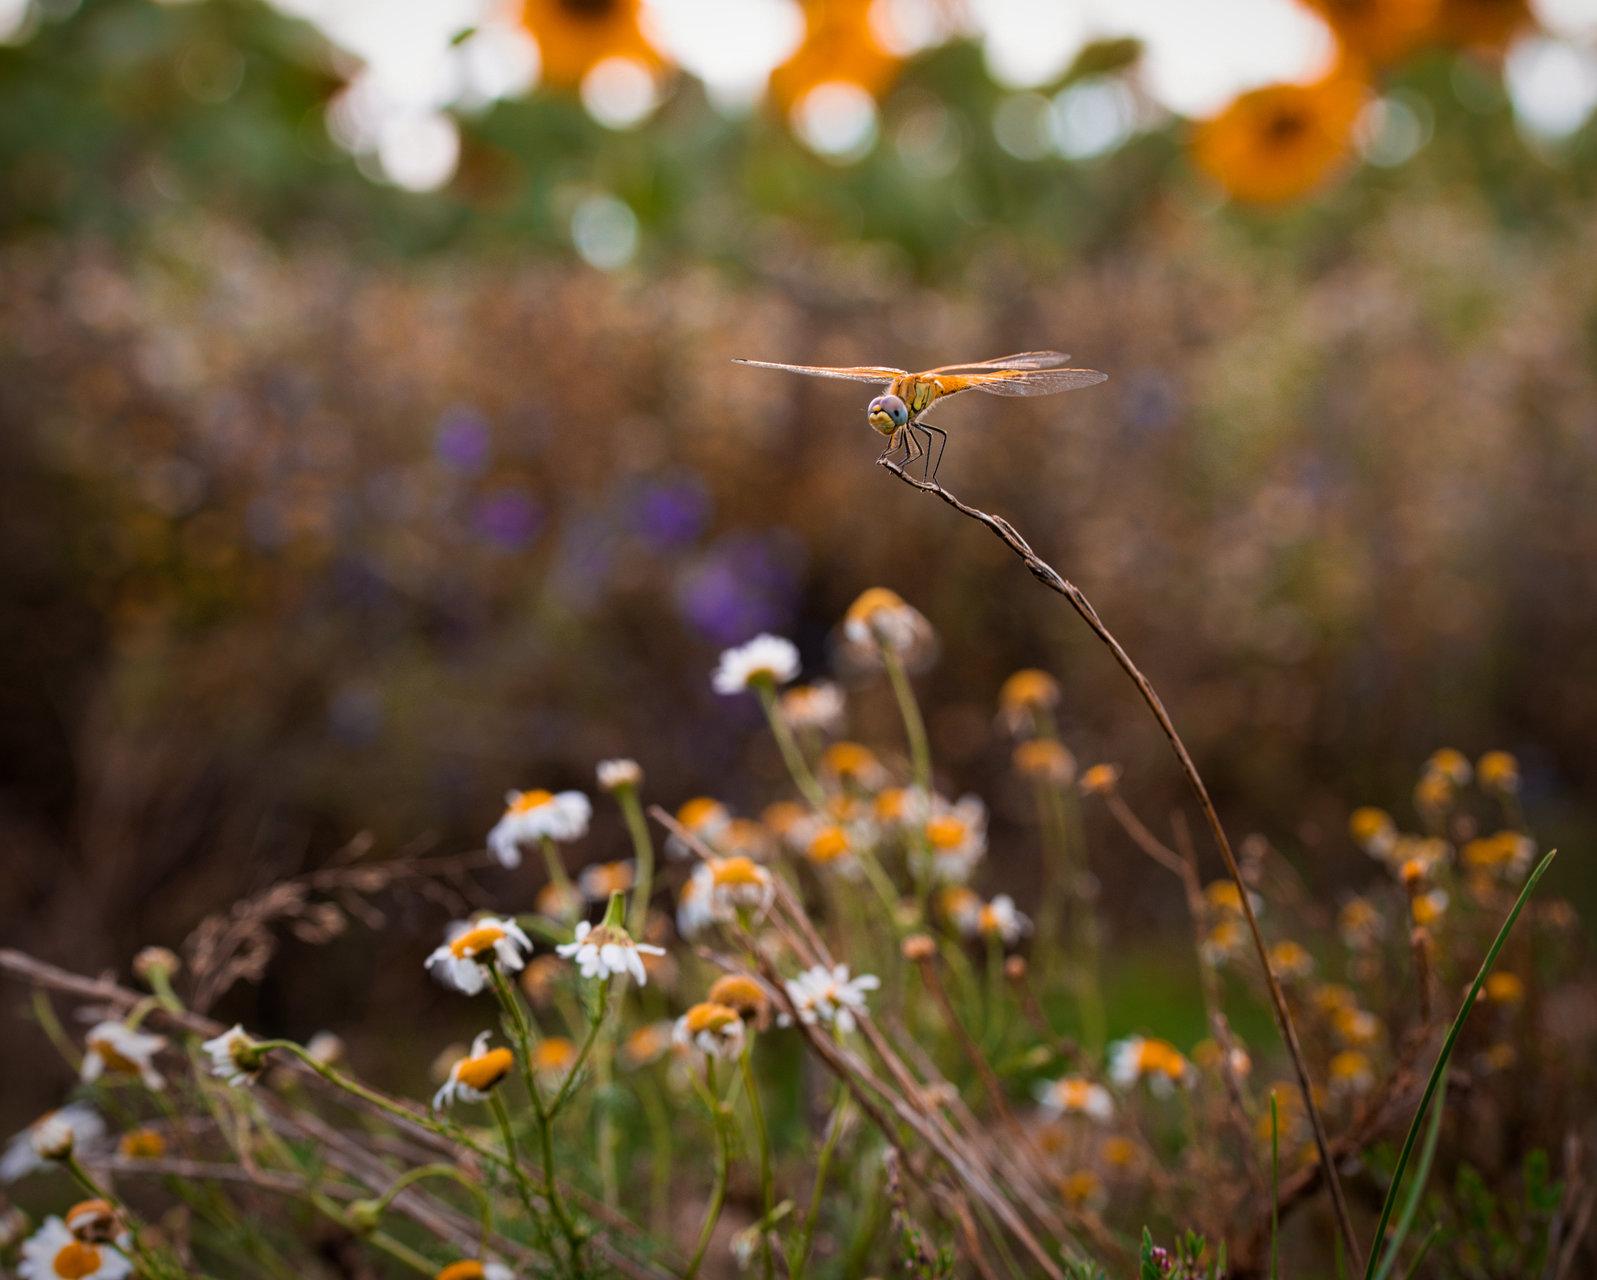 Photo in Low point of view | Author   - Barebu | PHOTO FORUM